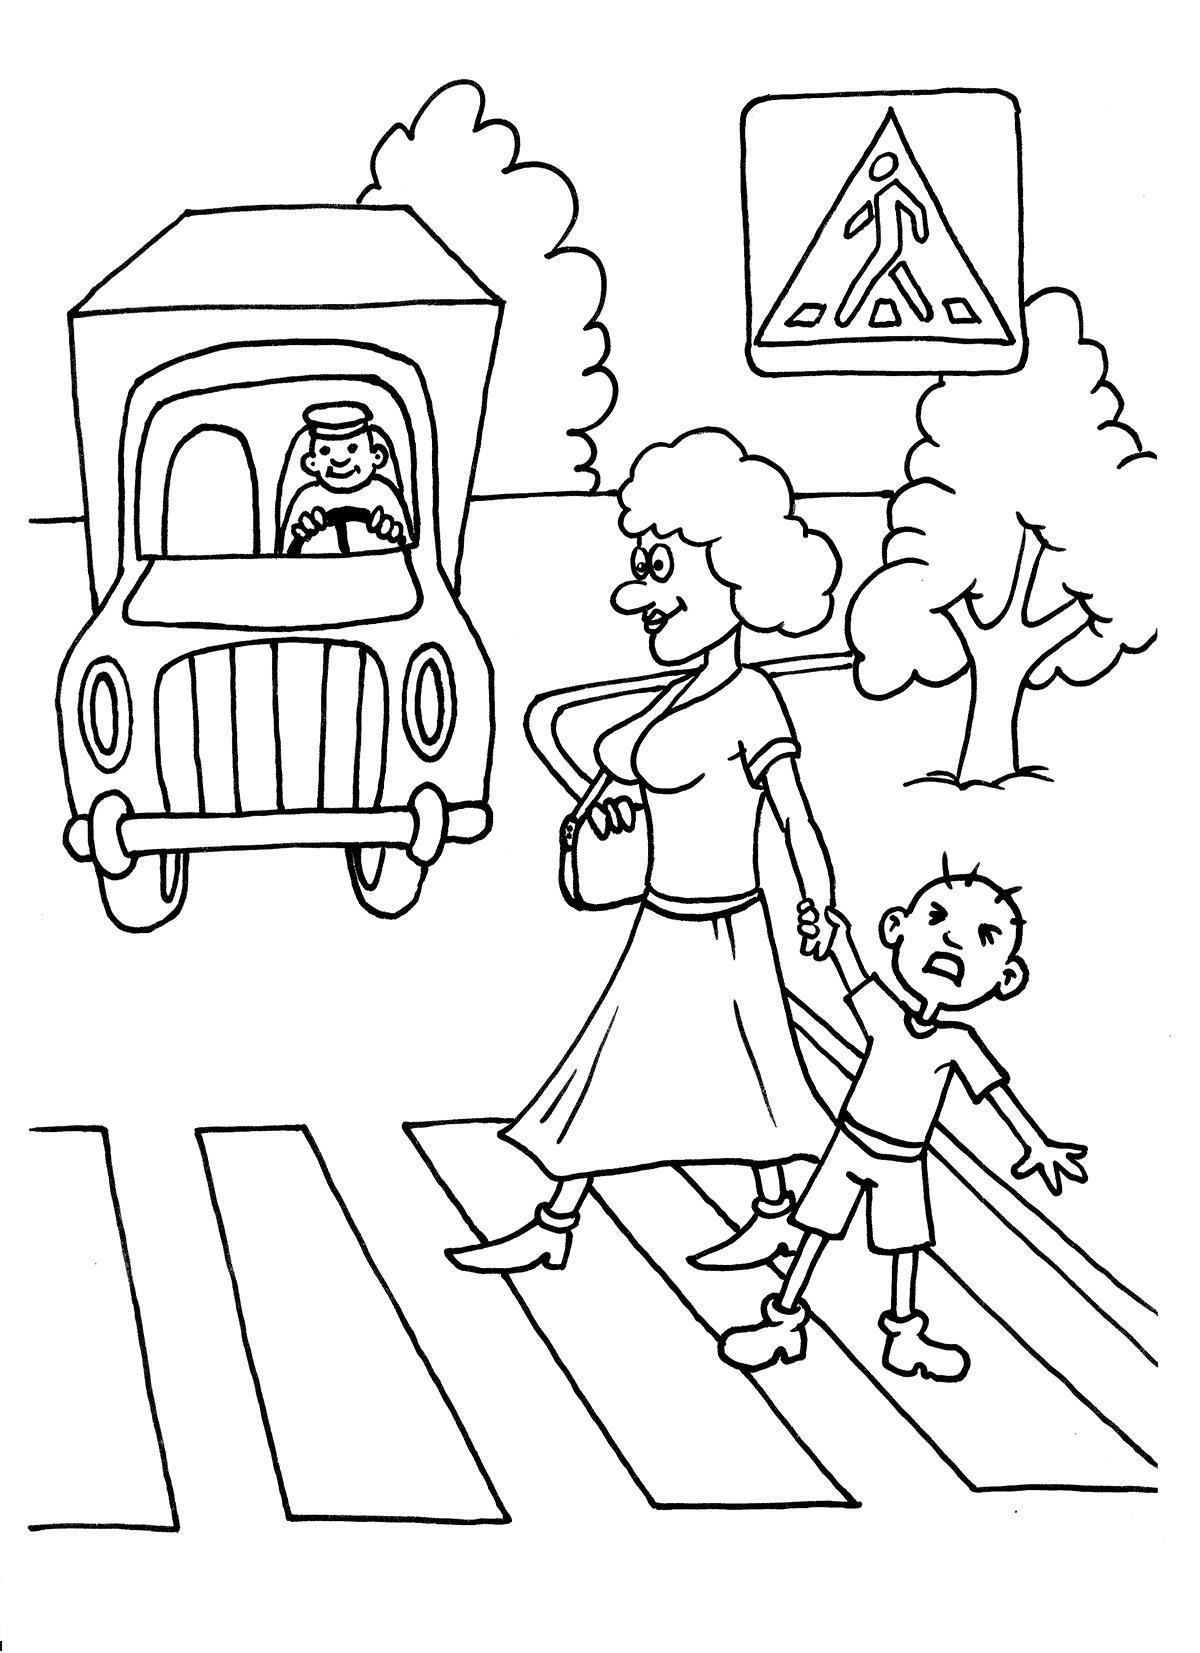 Безопасная дорога картинки раскраски